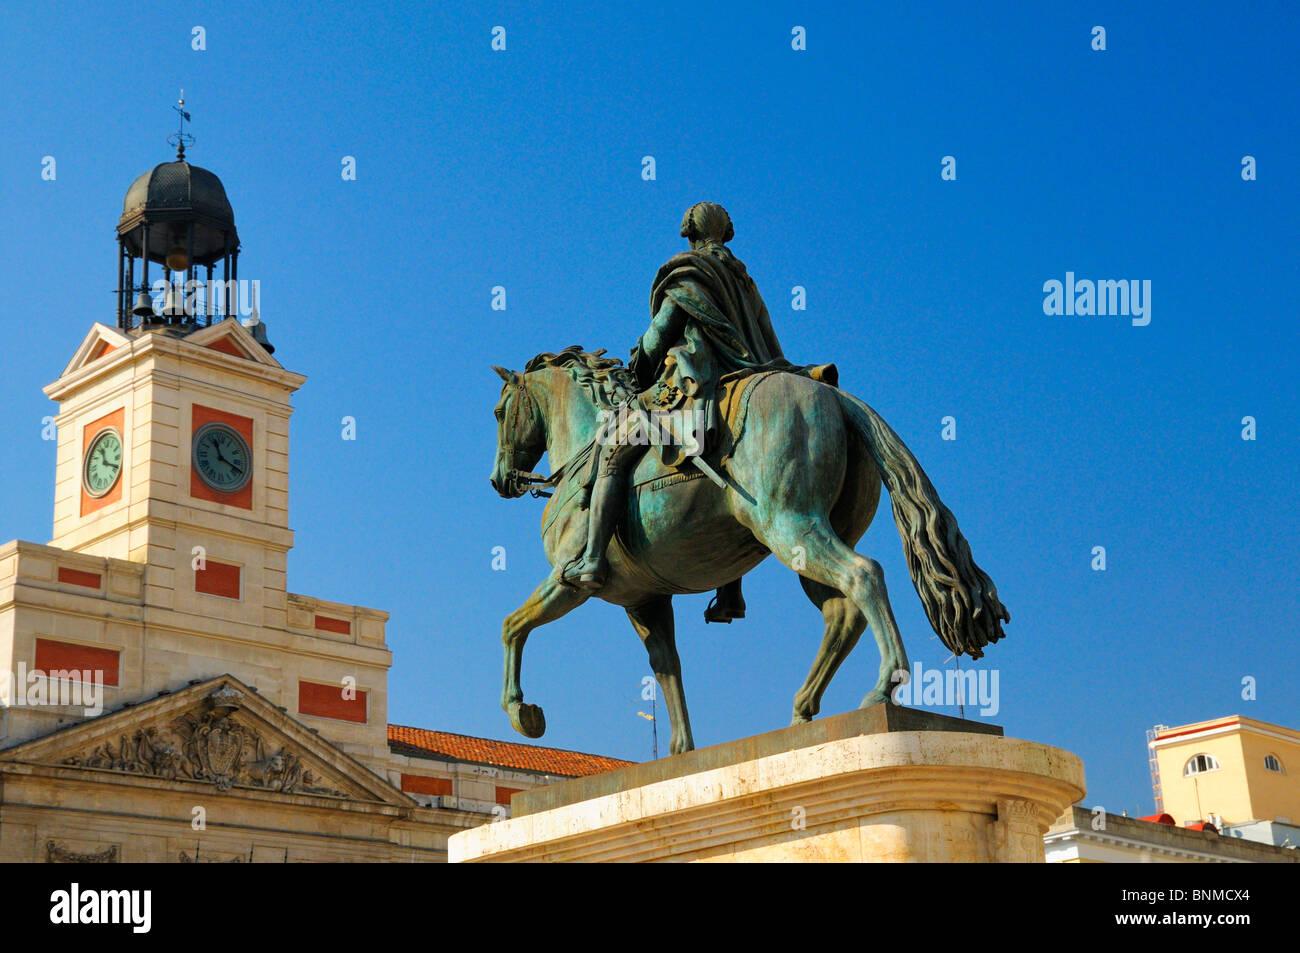 Equestrian statue of King Carlos III and clock tower of Real Casa de Correos, Puerta del Sol, Madrid, Spain Stock Photo